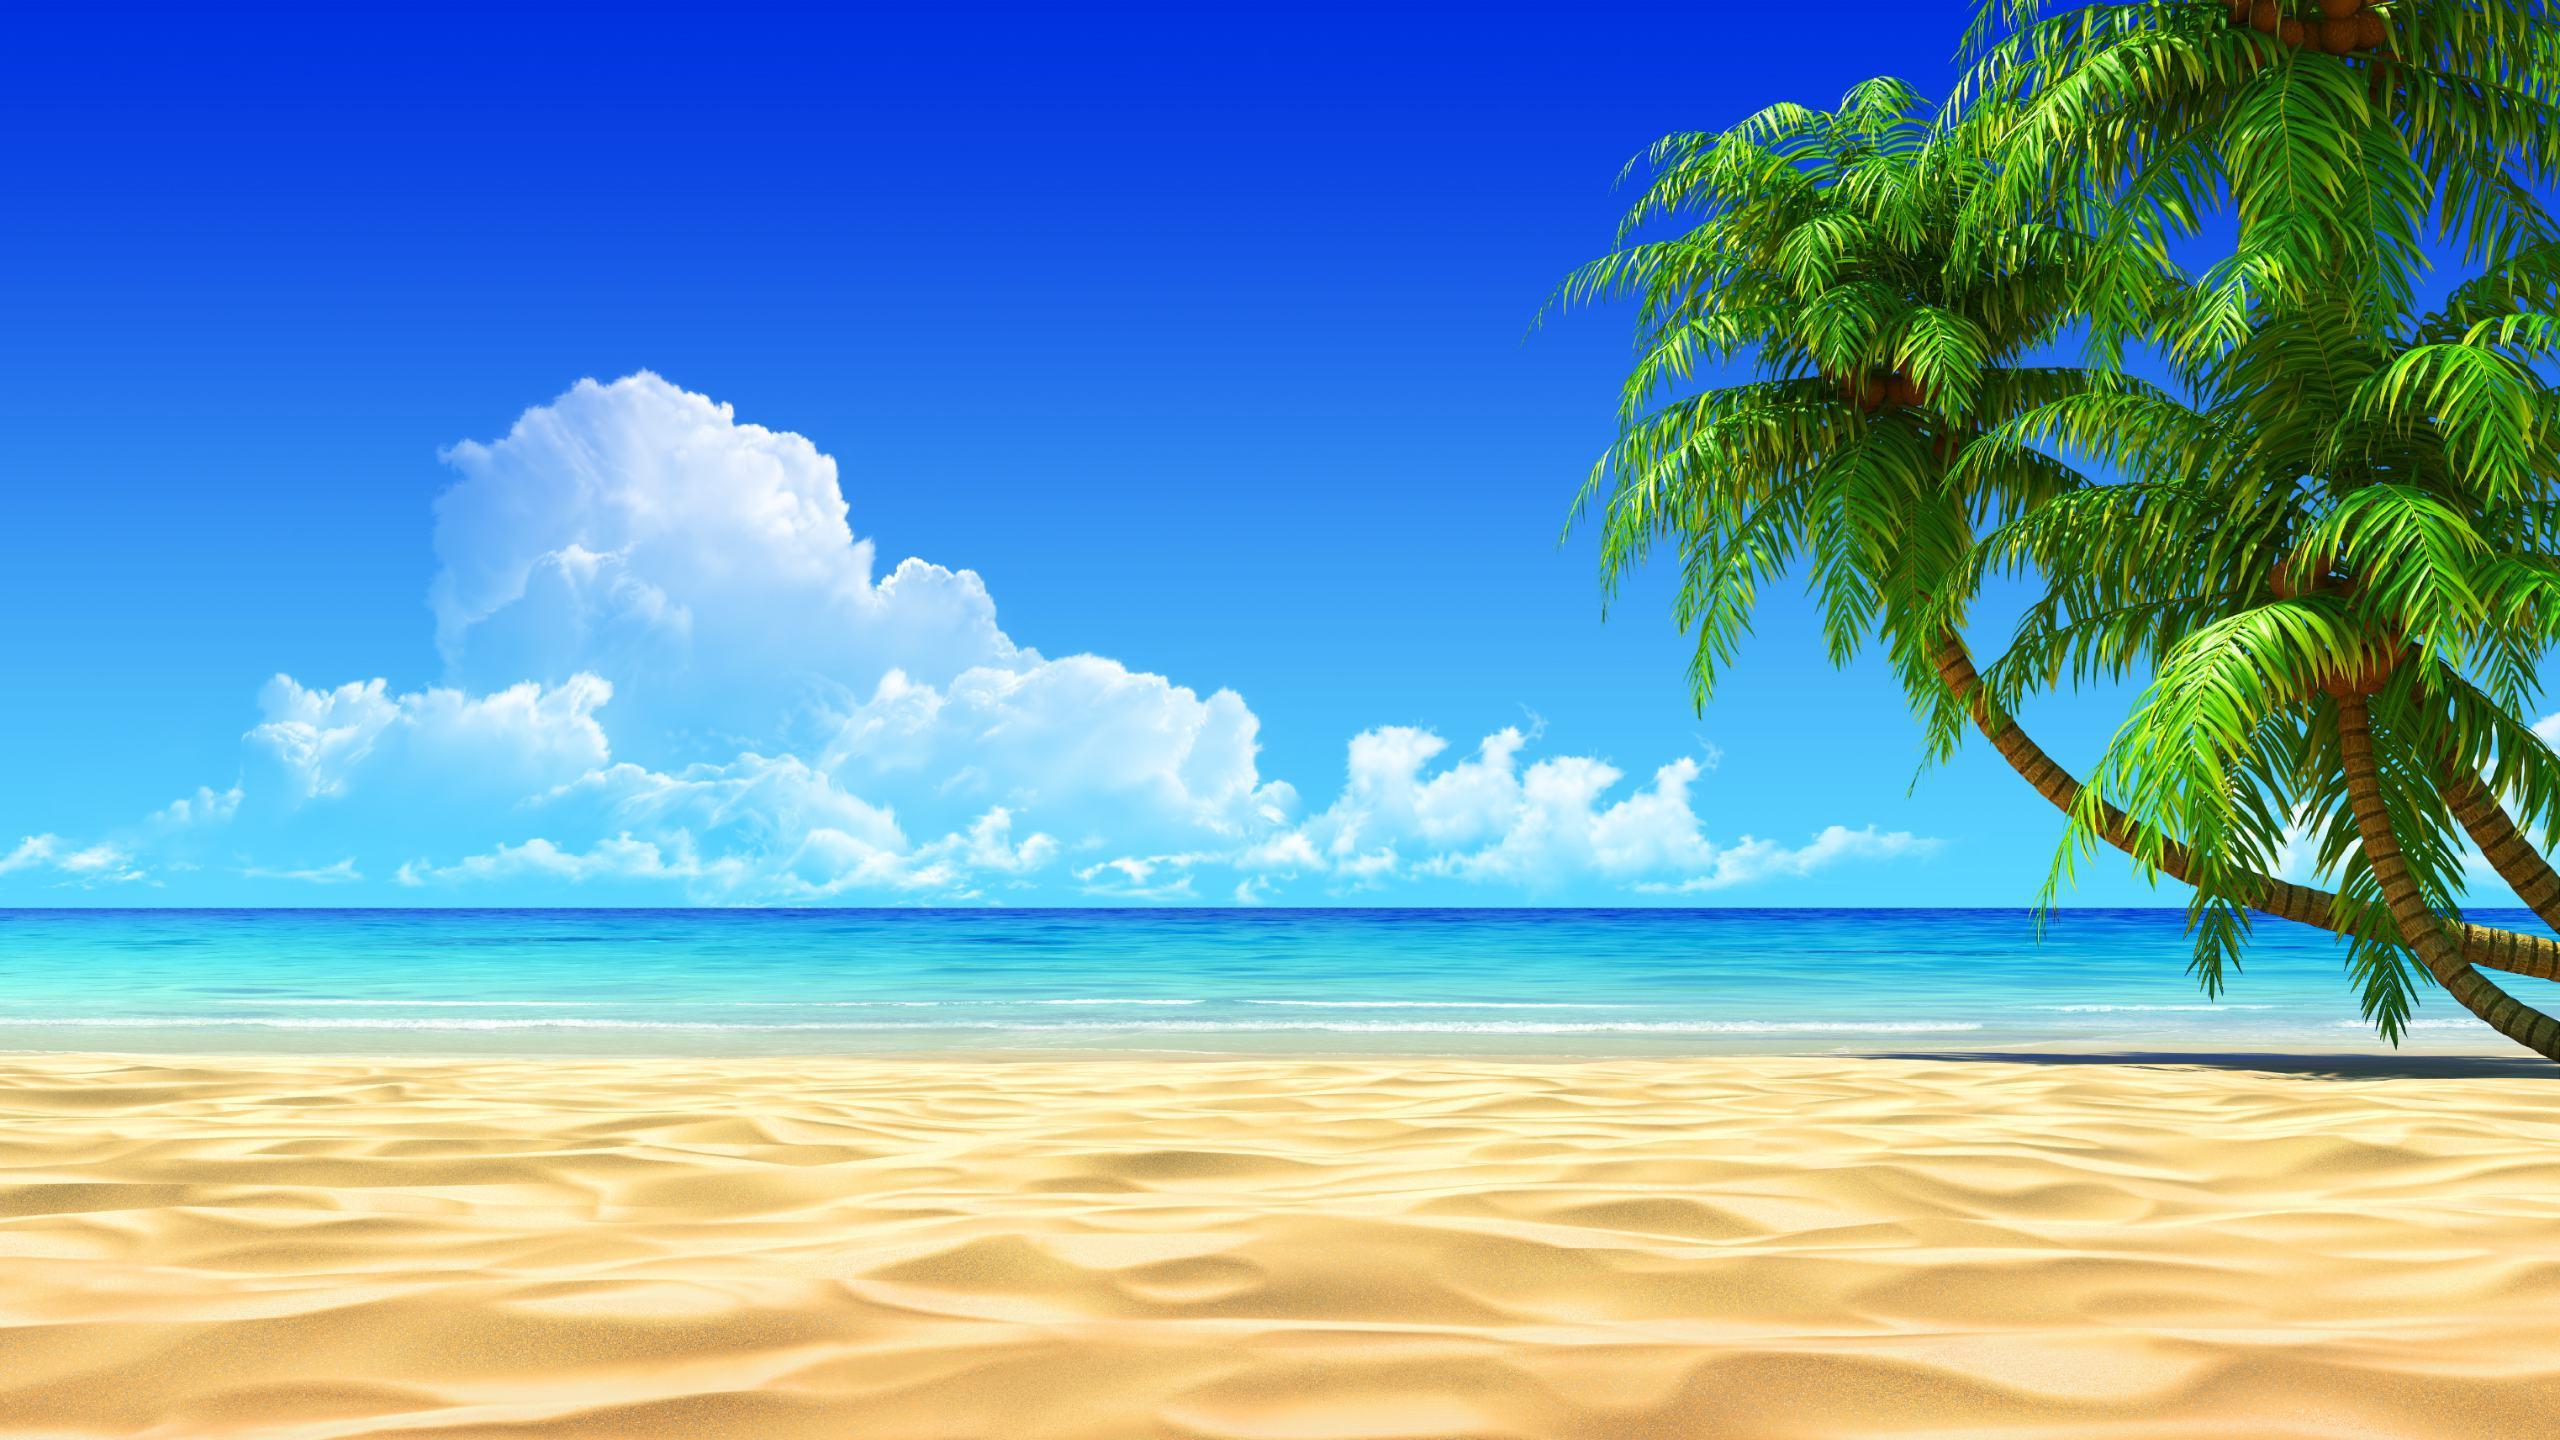 Beach clipart backgrounds 7 » Clipart Portal.